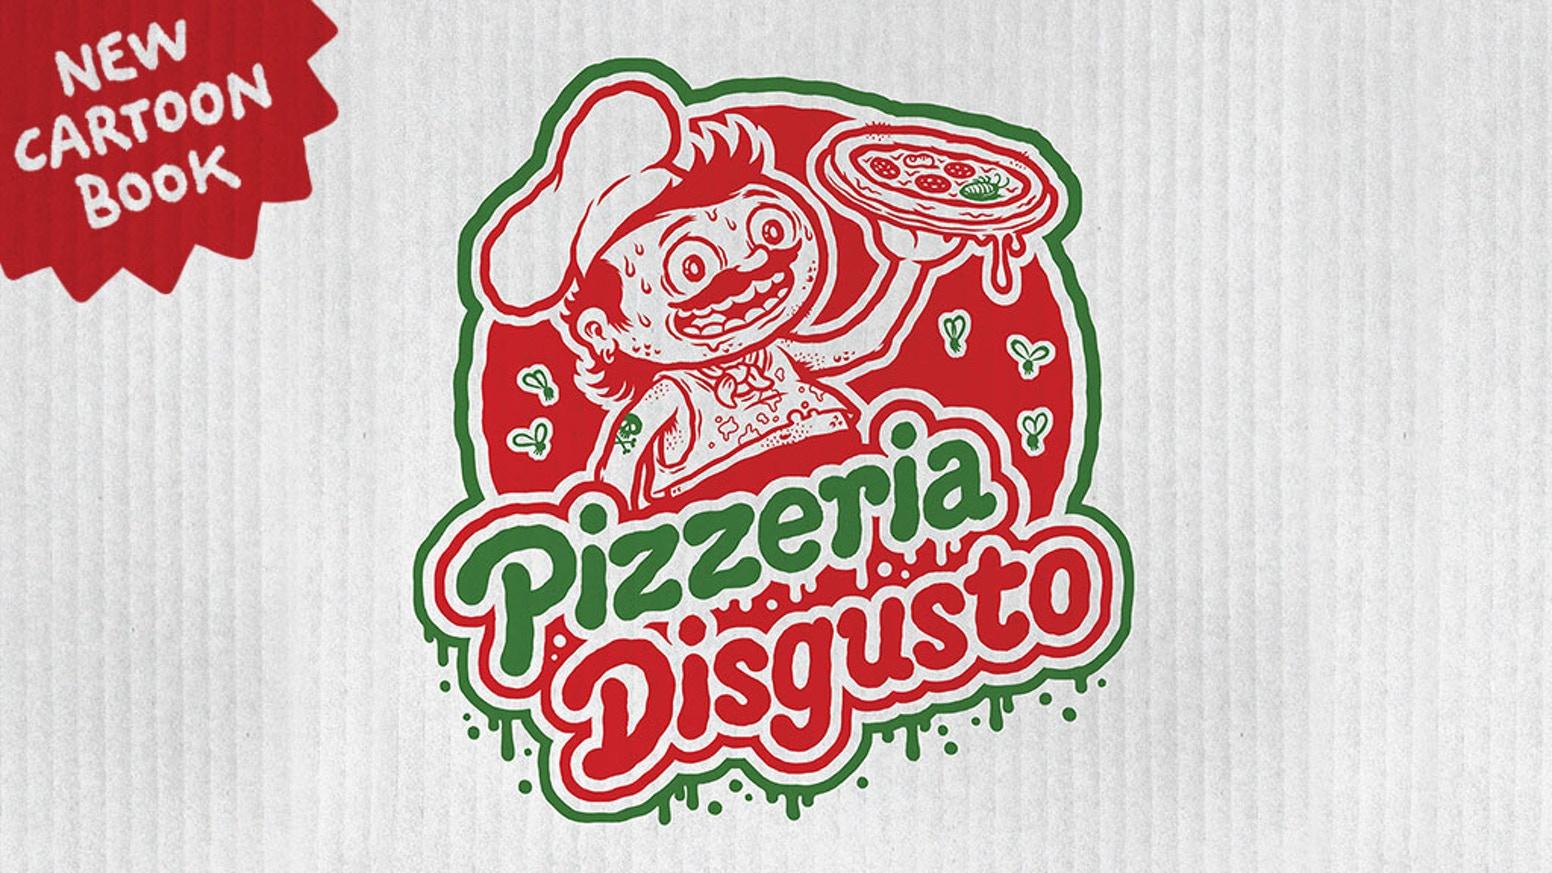 Pizzeria Disgusto – Cartoon Book